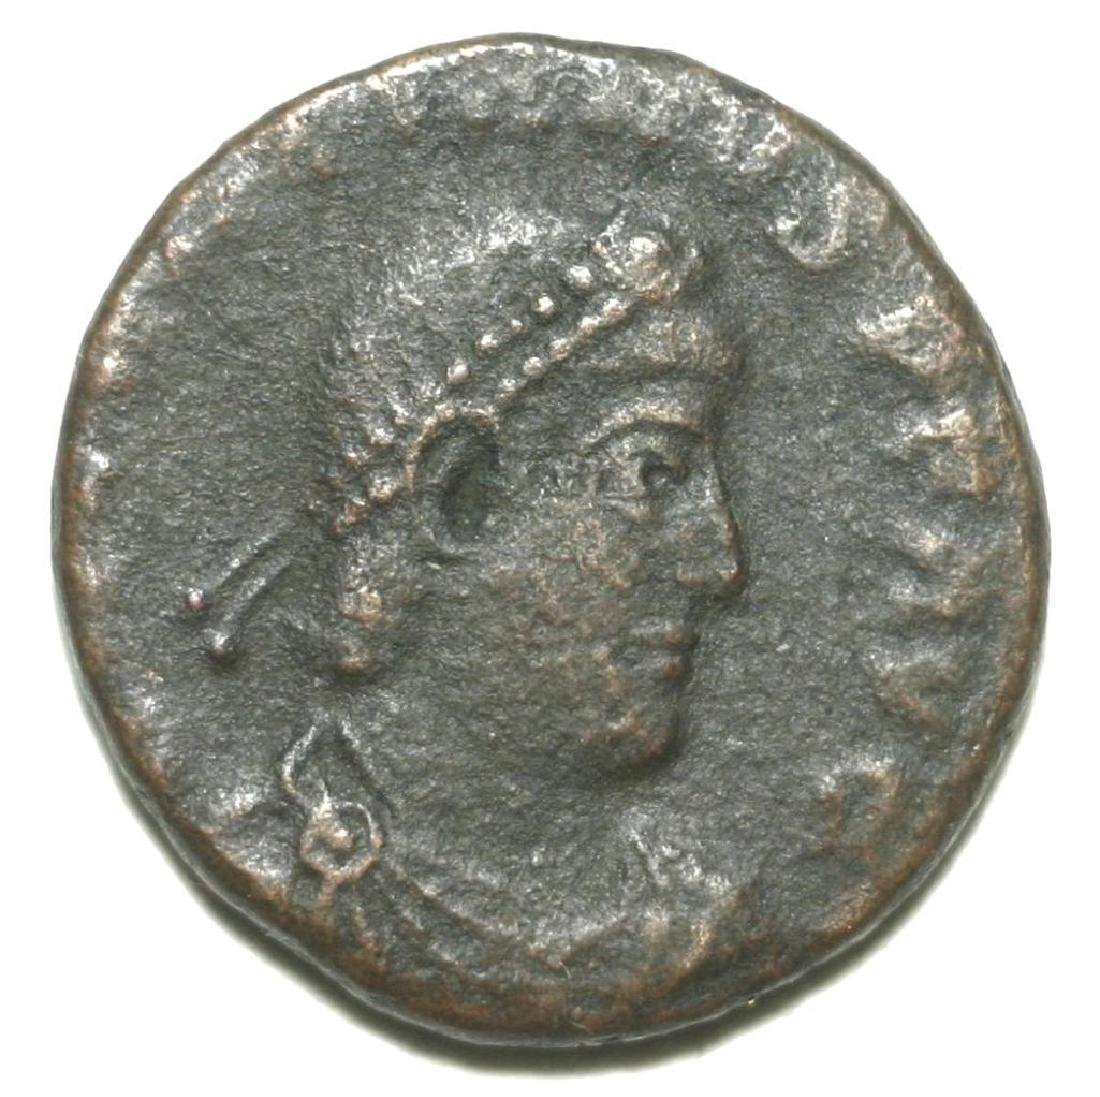 Roman Bronze Coin Follis Valentinianus Gloria Romanorum - 3